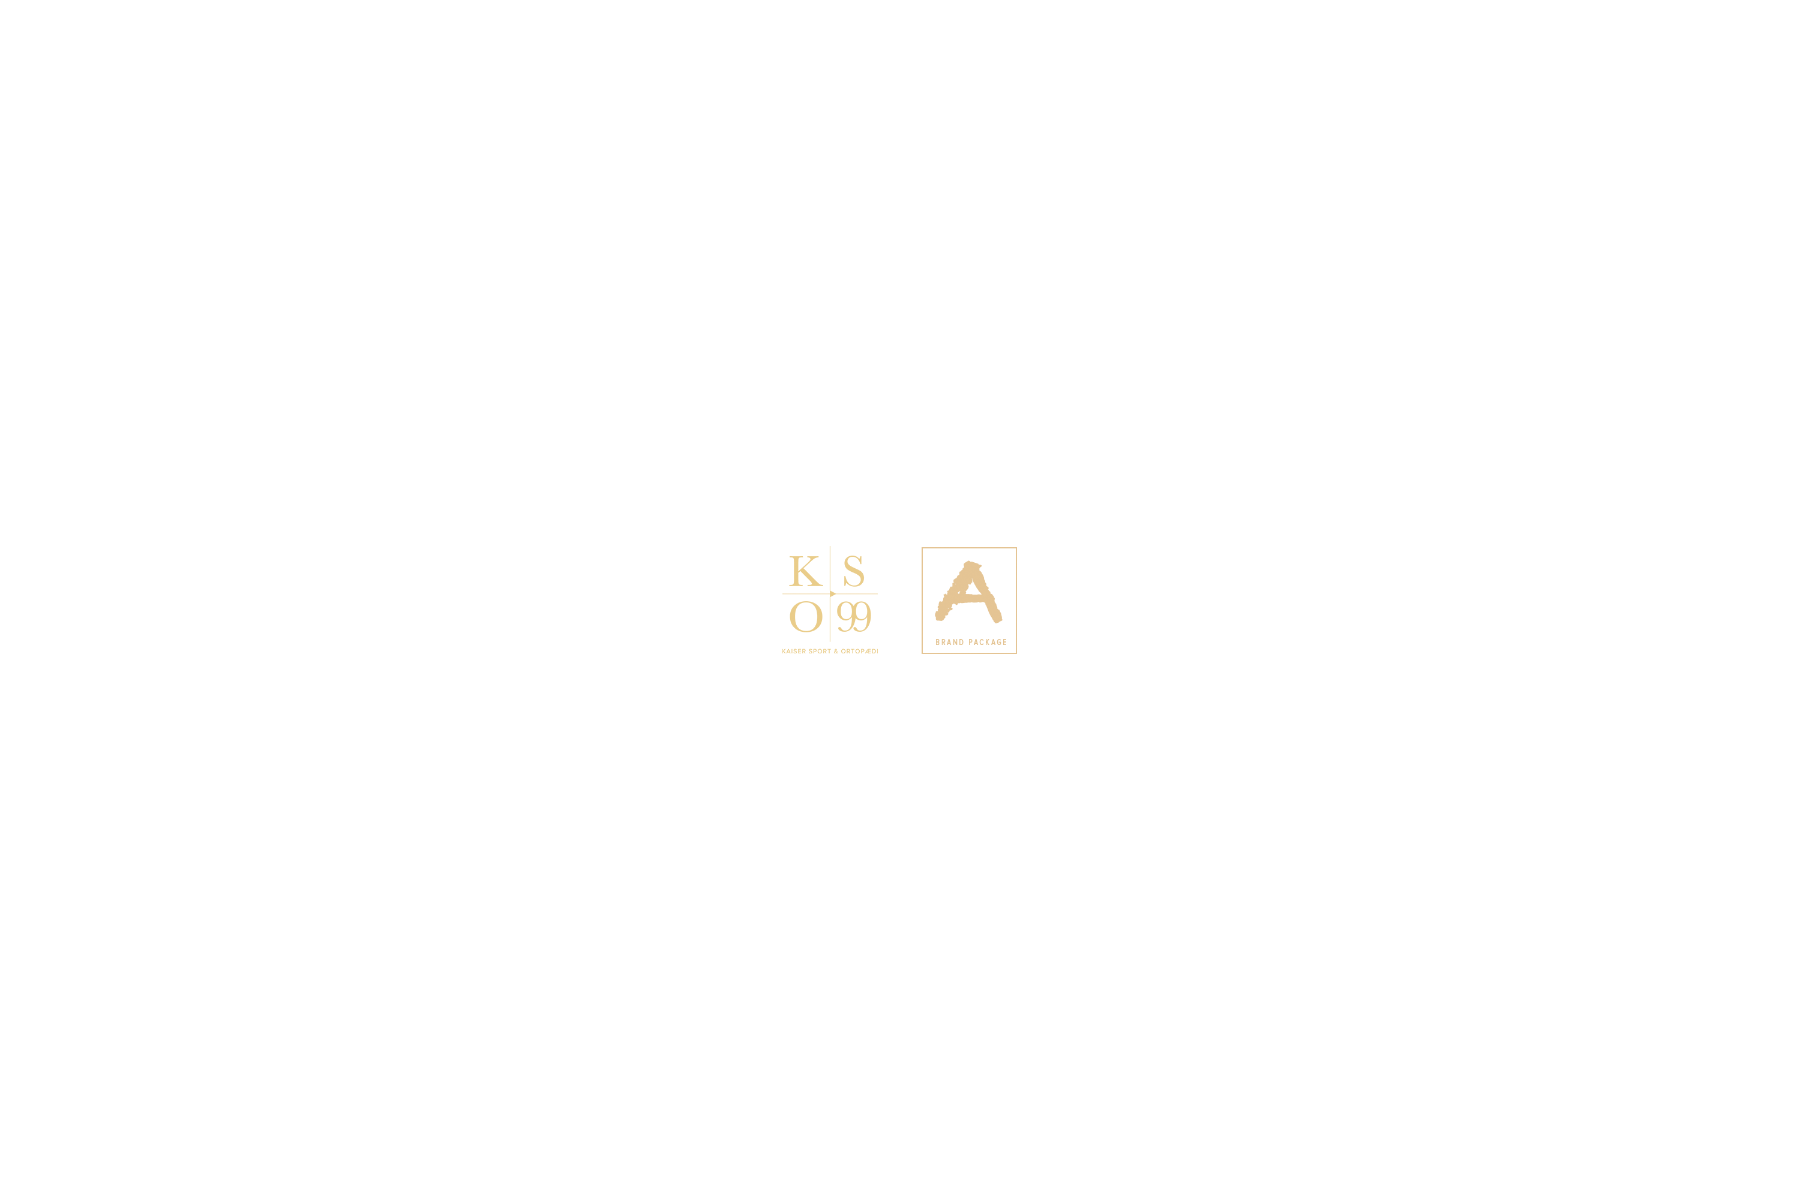 kso-brand-package-2020-2